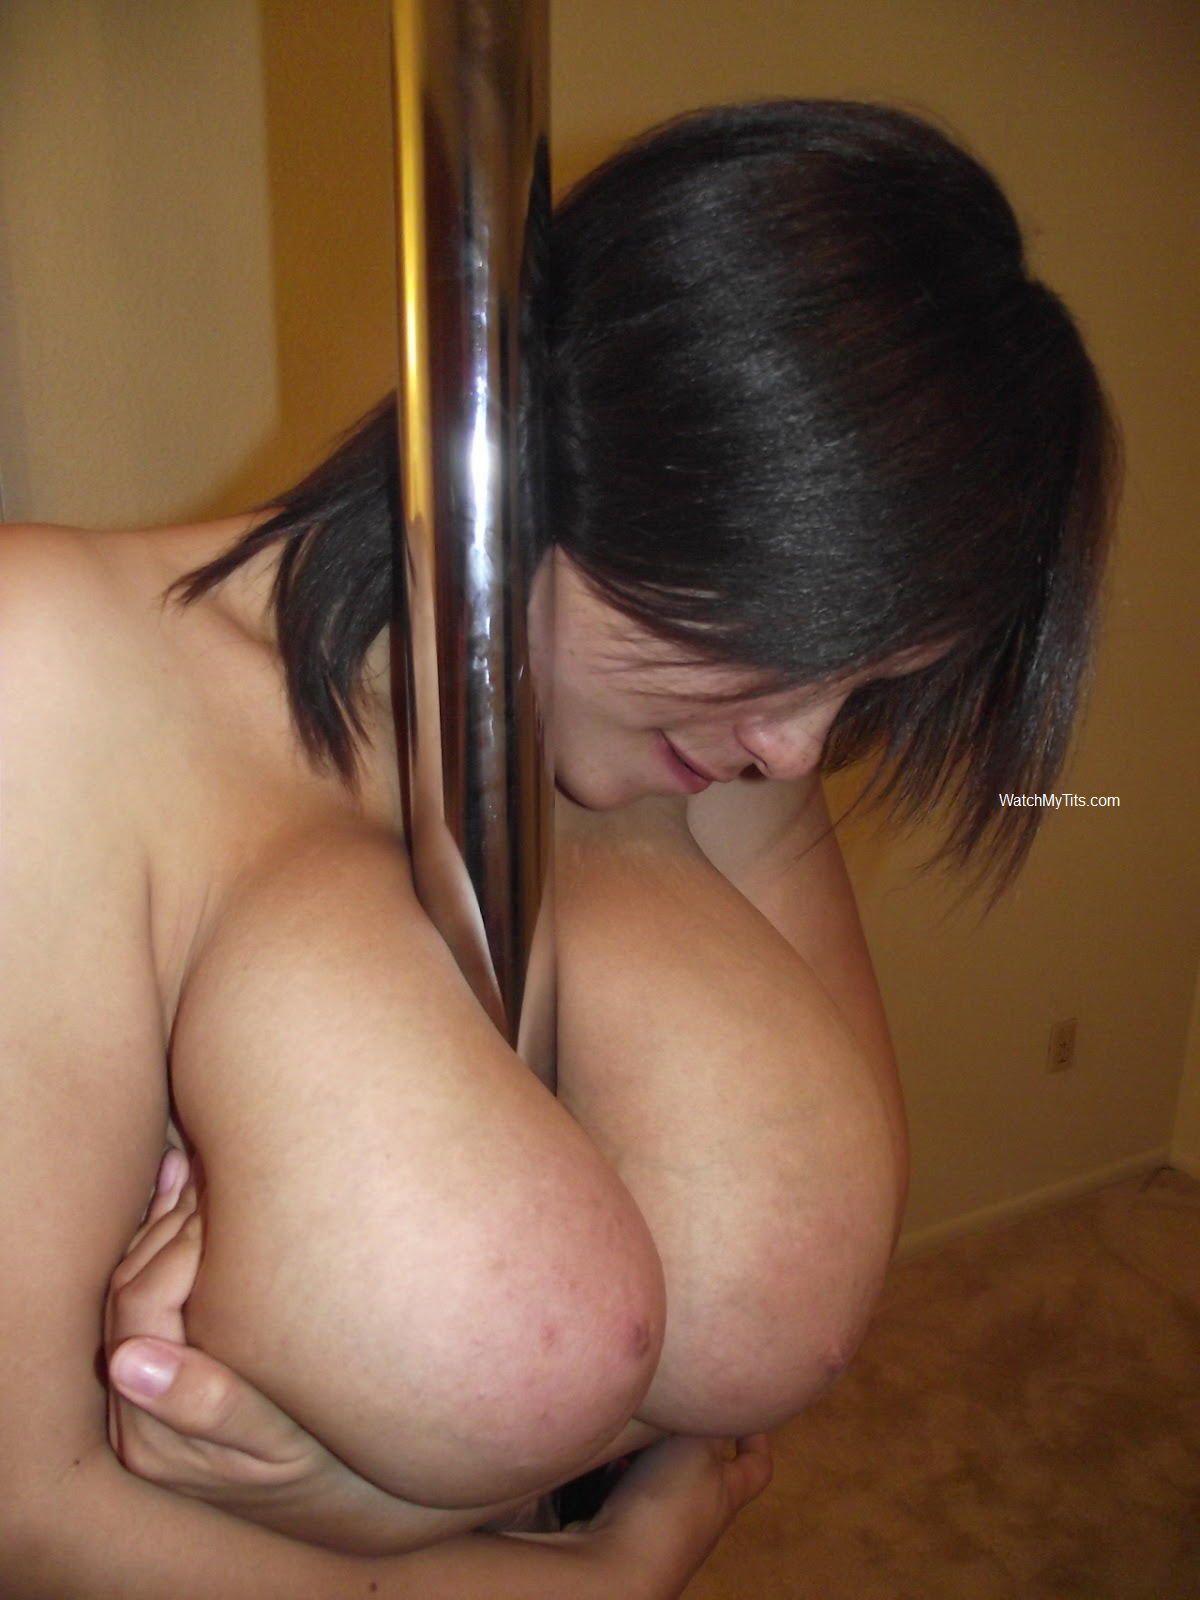 Watch my tits.com